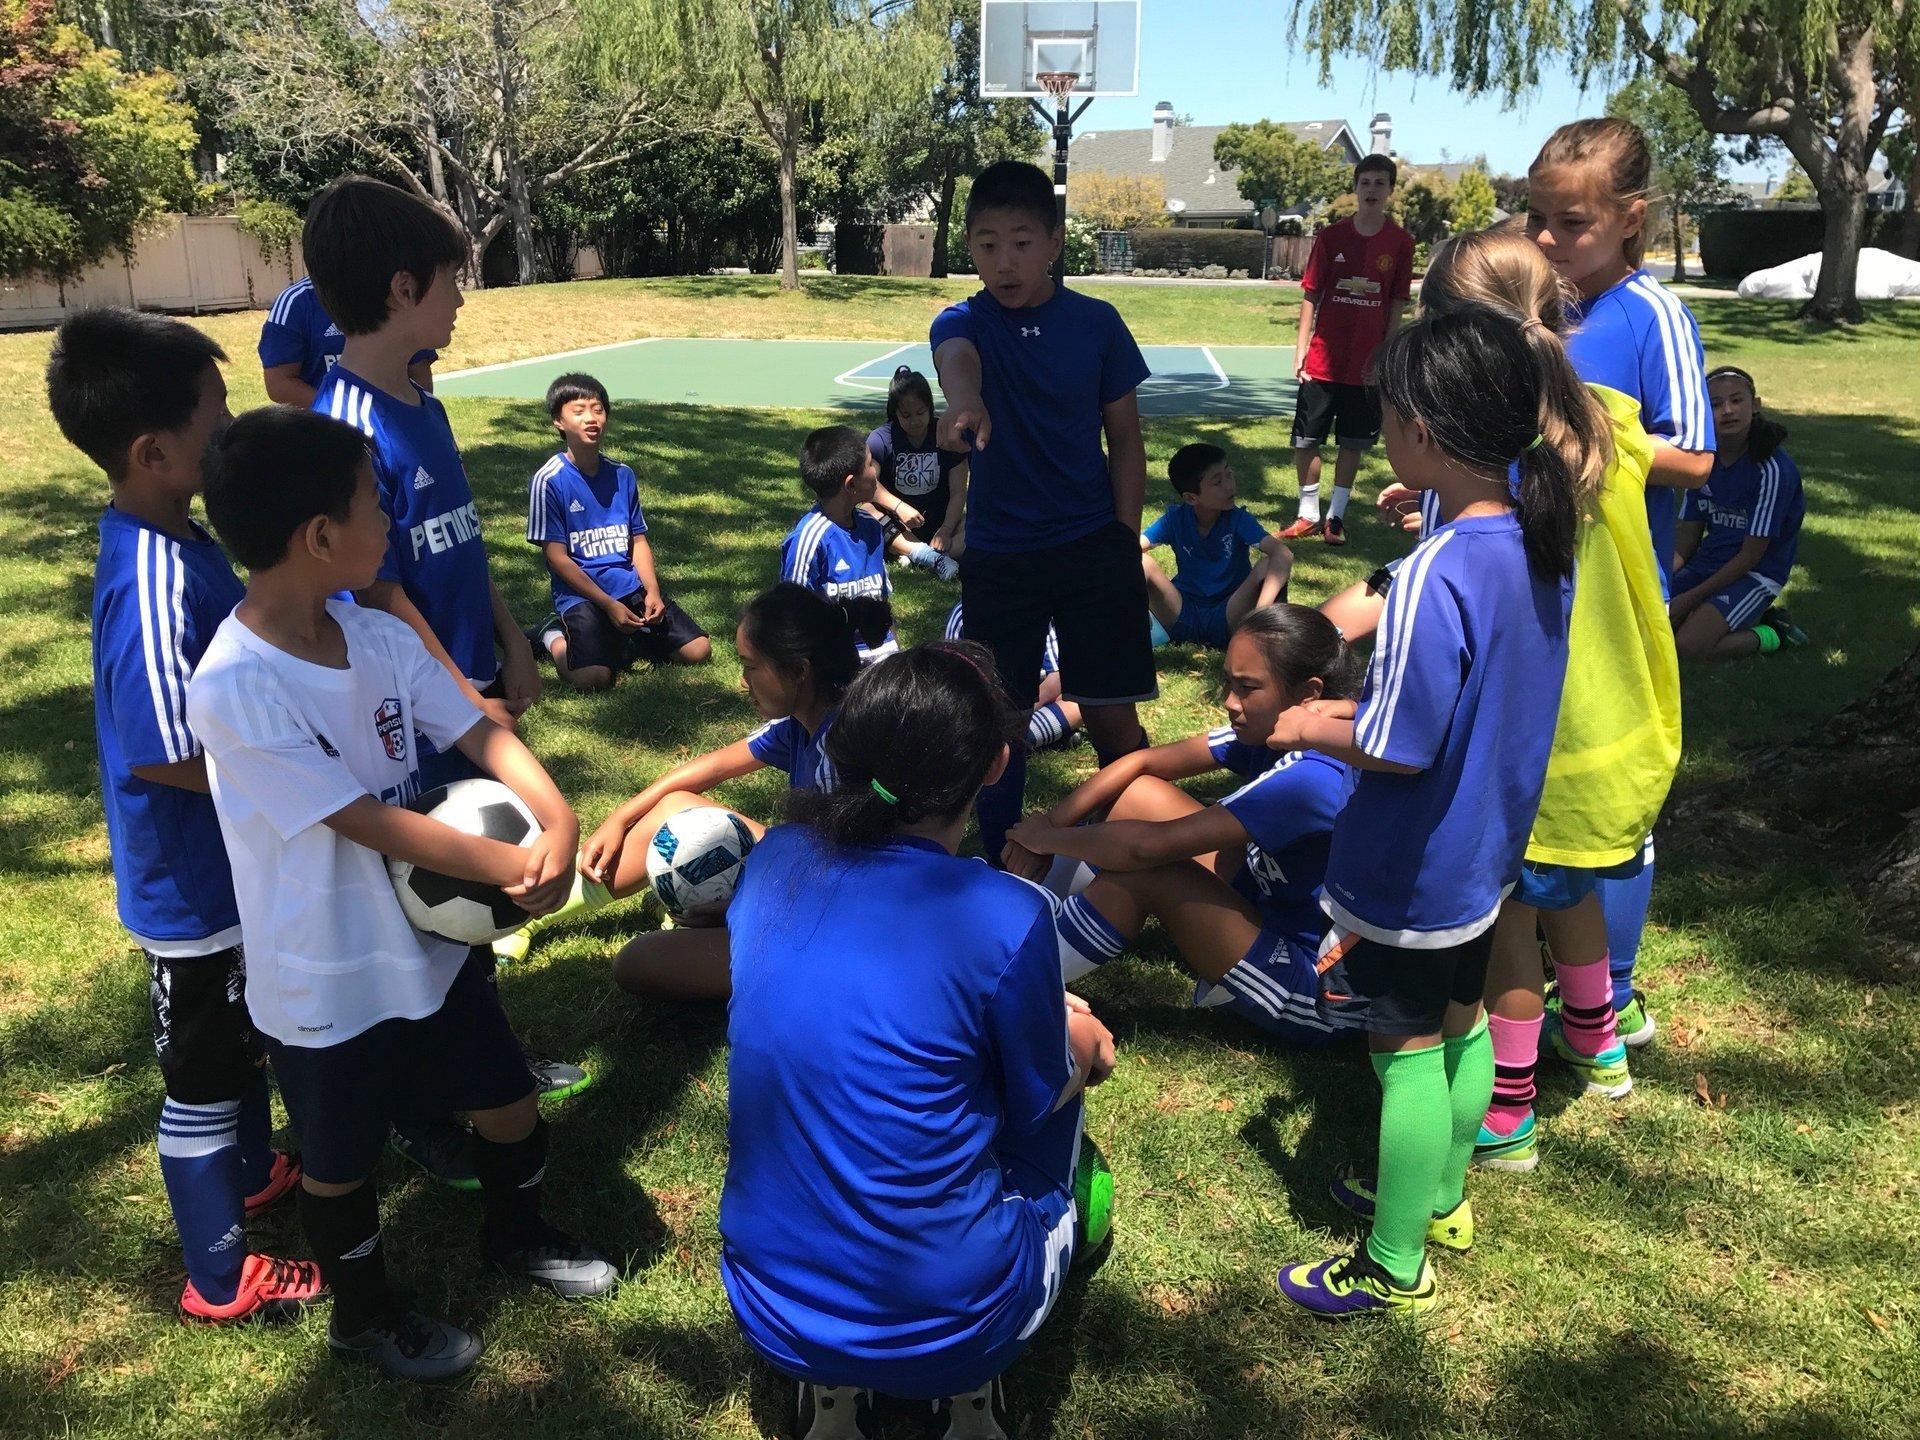 Peninsula Youth Soccer - Summer Camp!